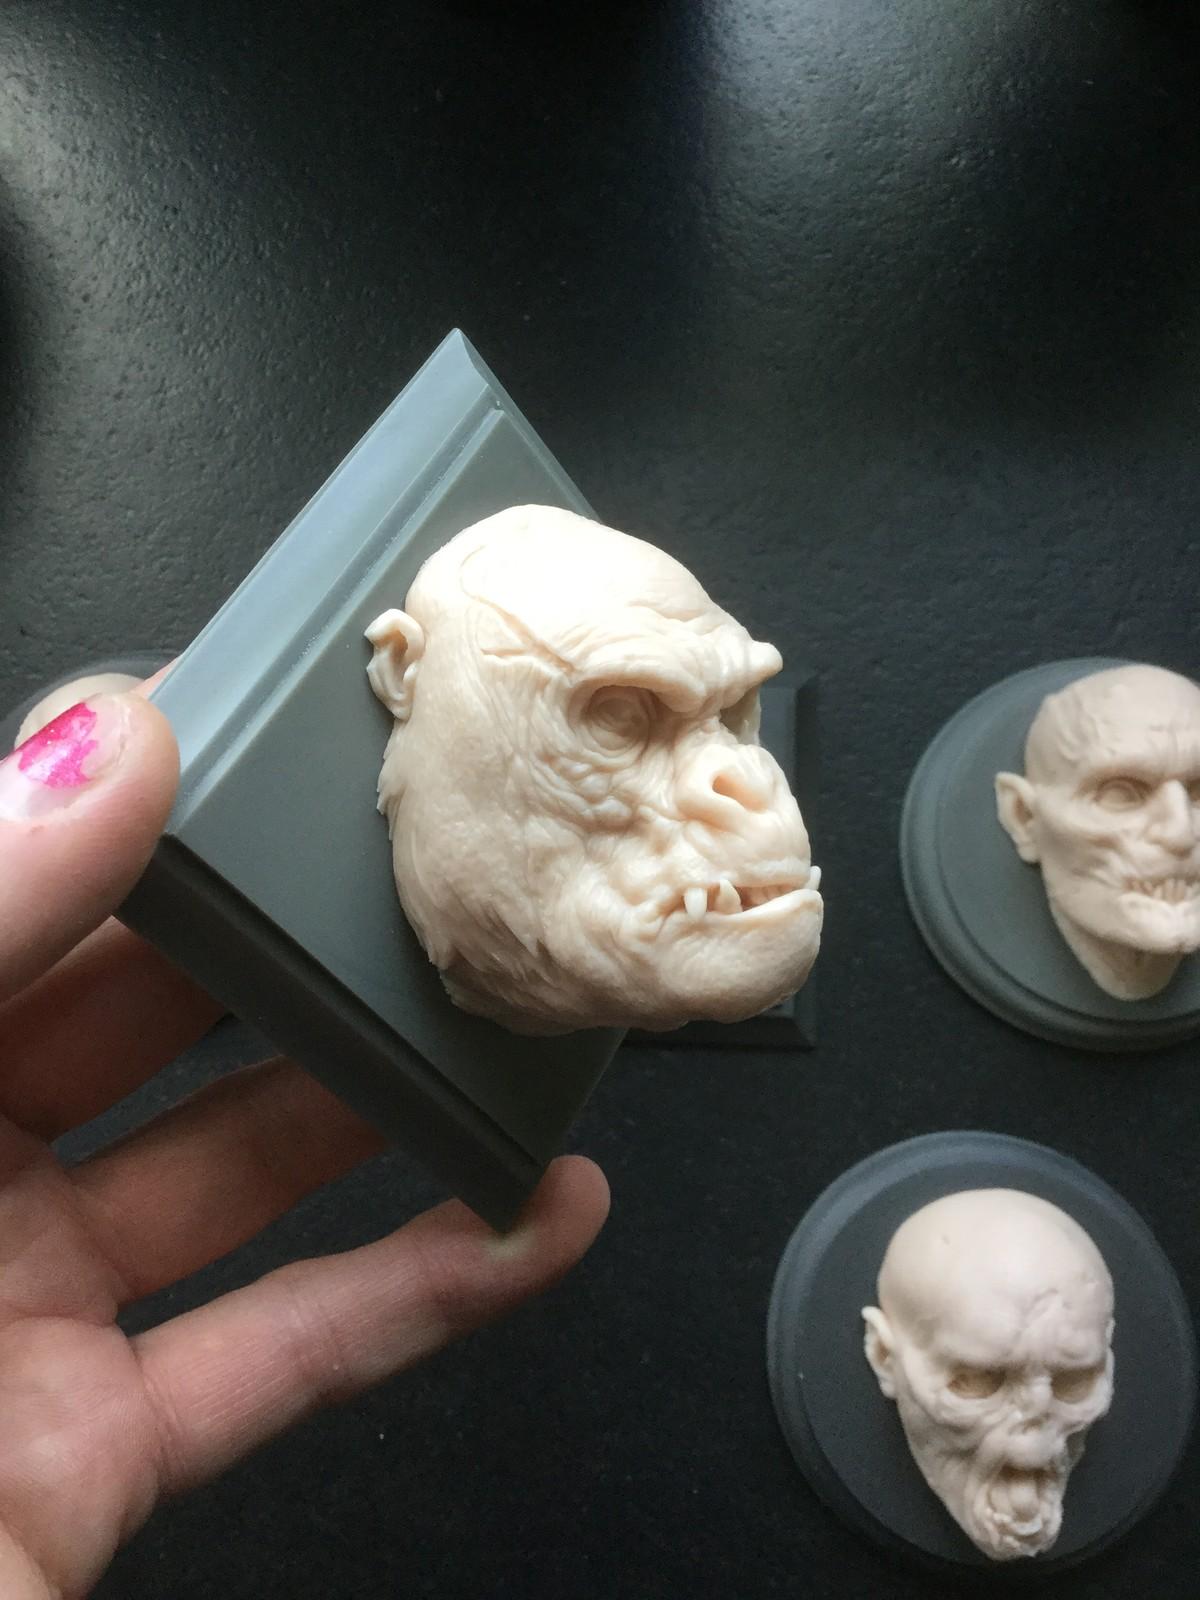 Gorilla/cast resin